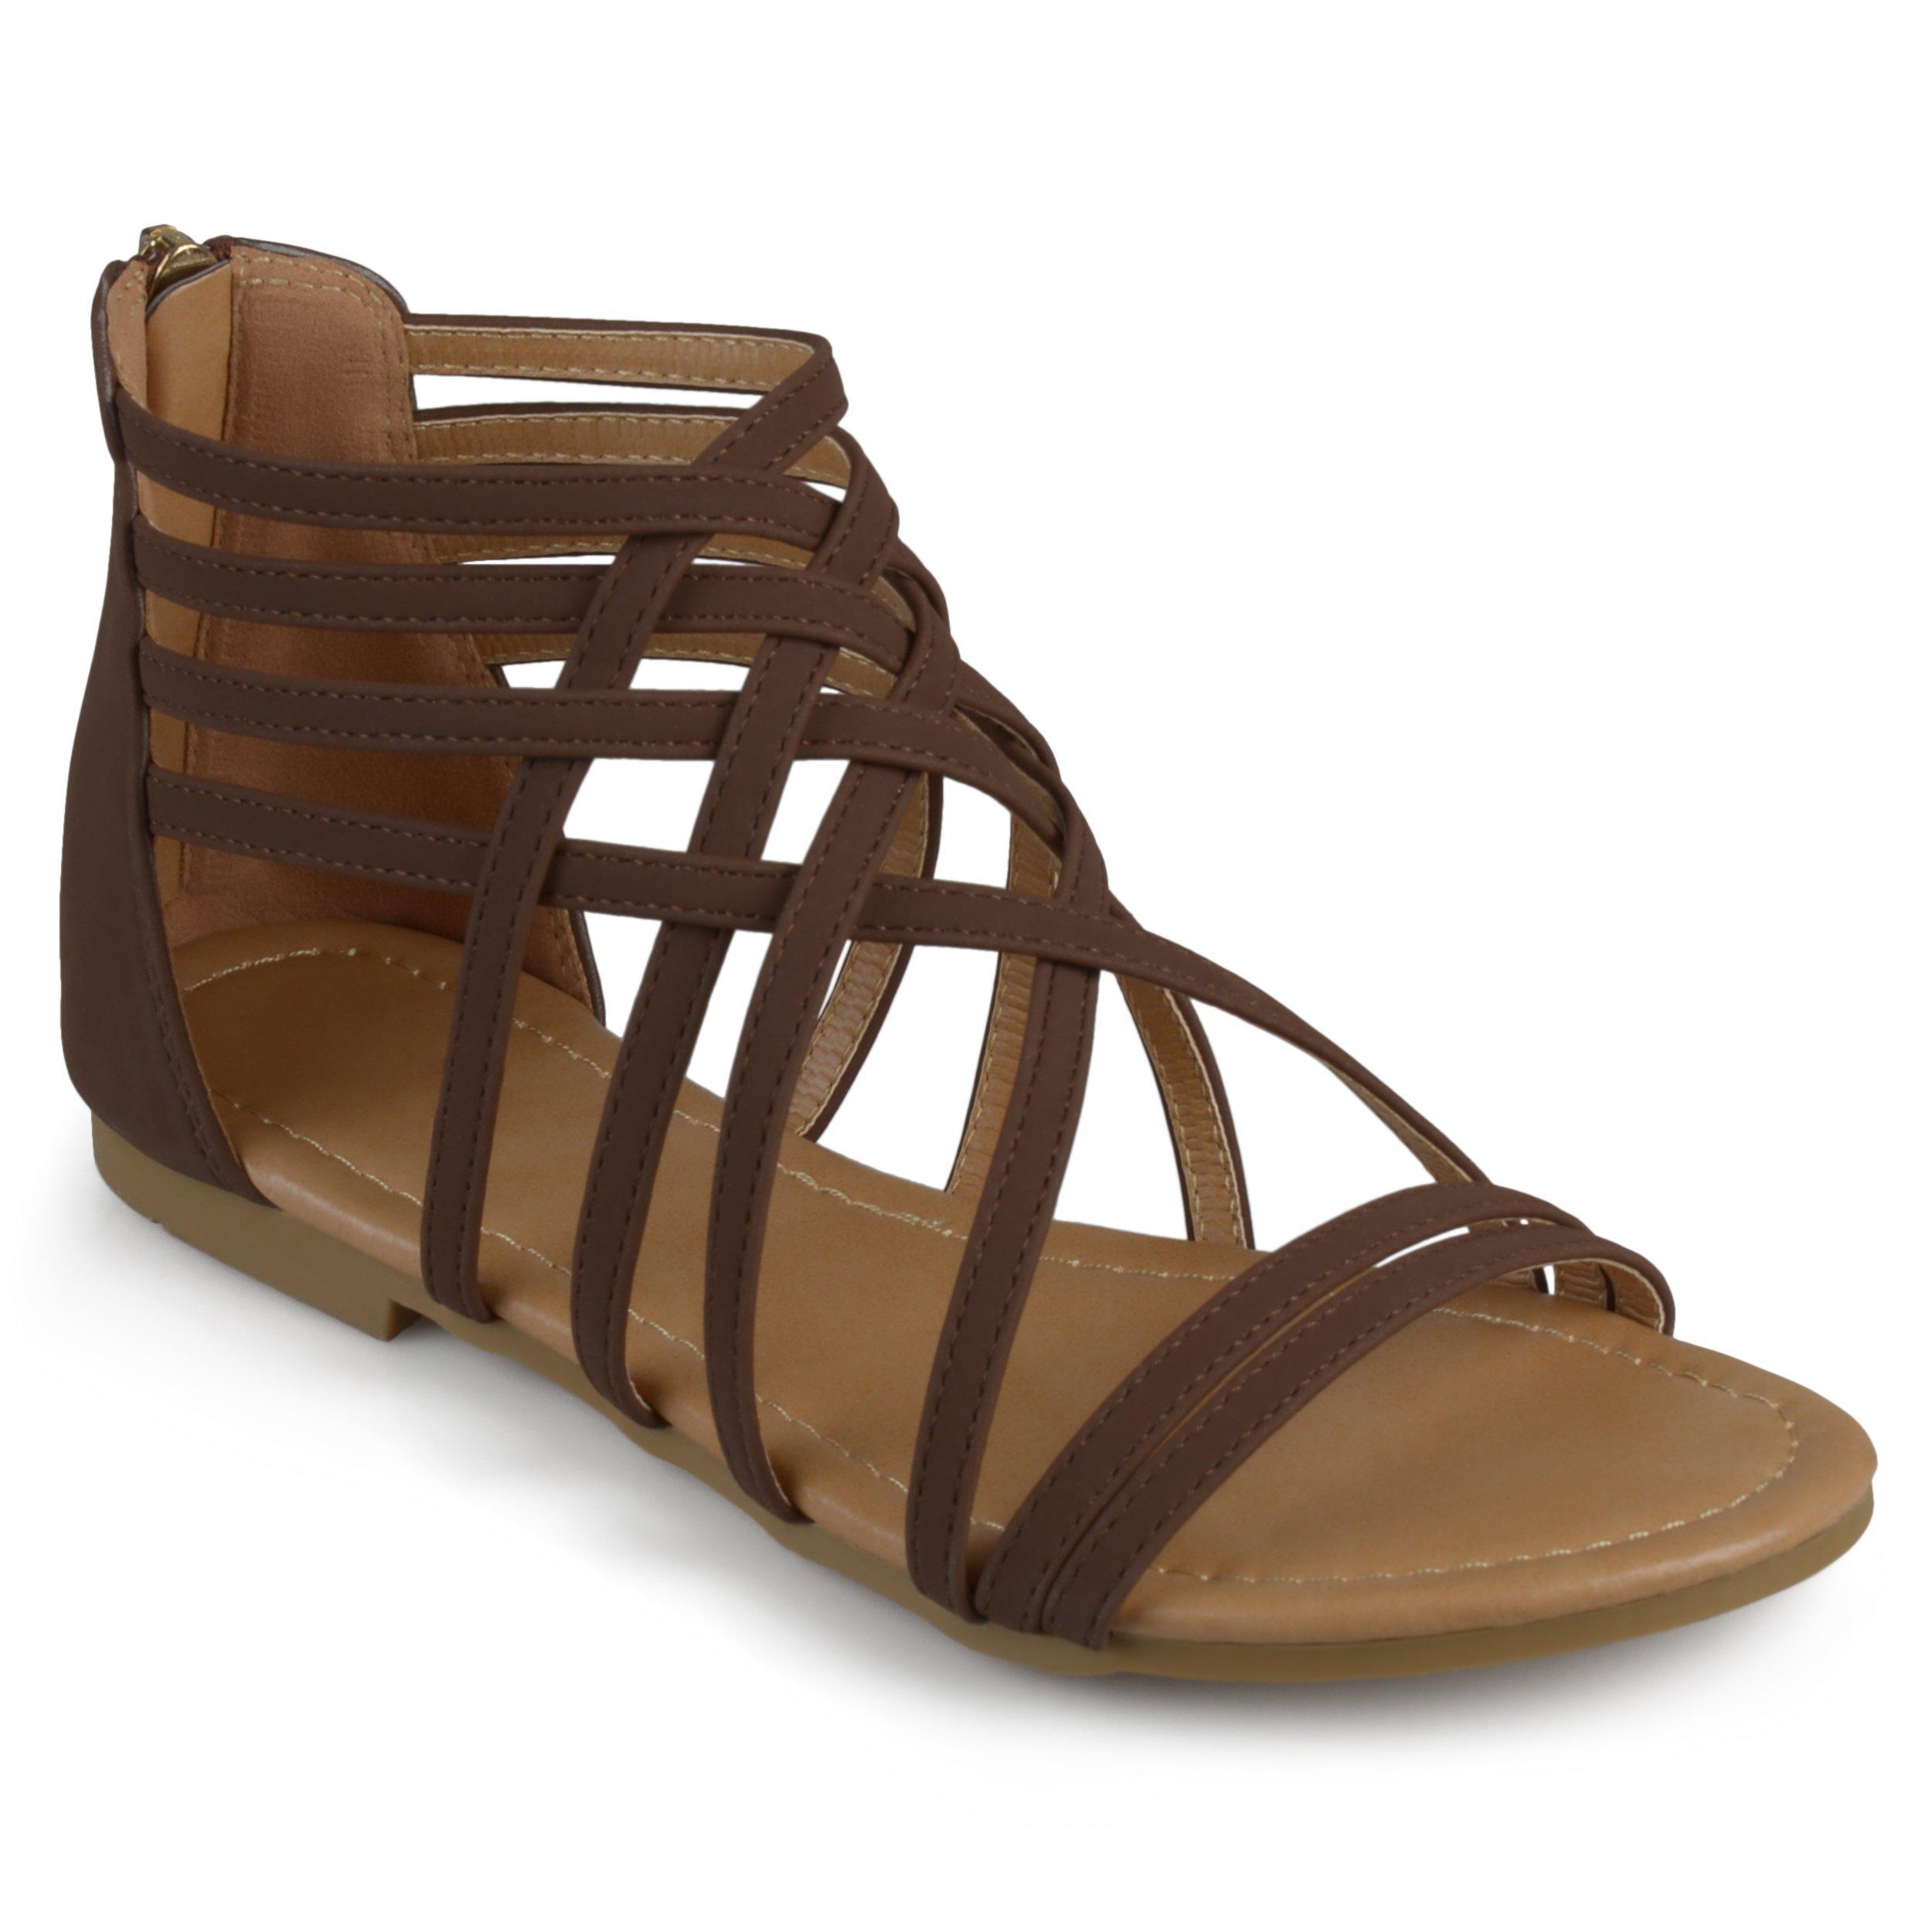 Hanni In 2020 Flat Gladiator Sandals Gladiator Sandals